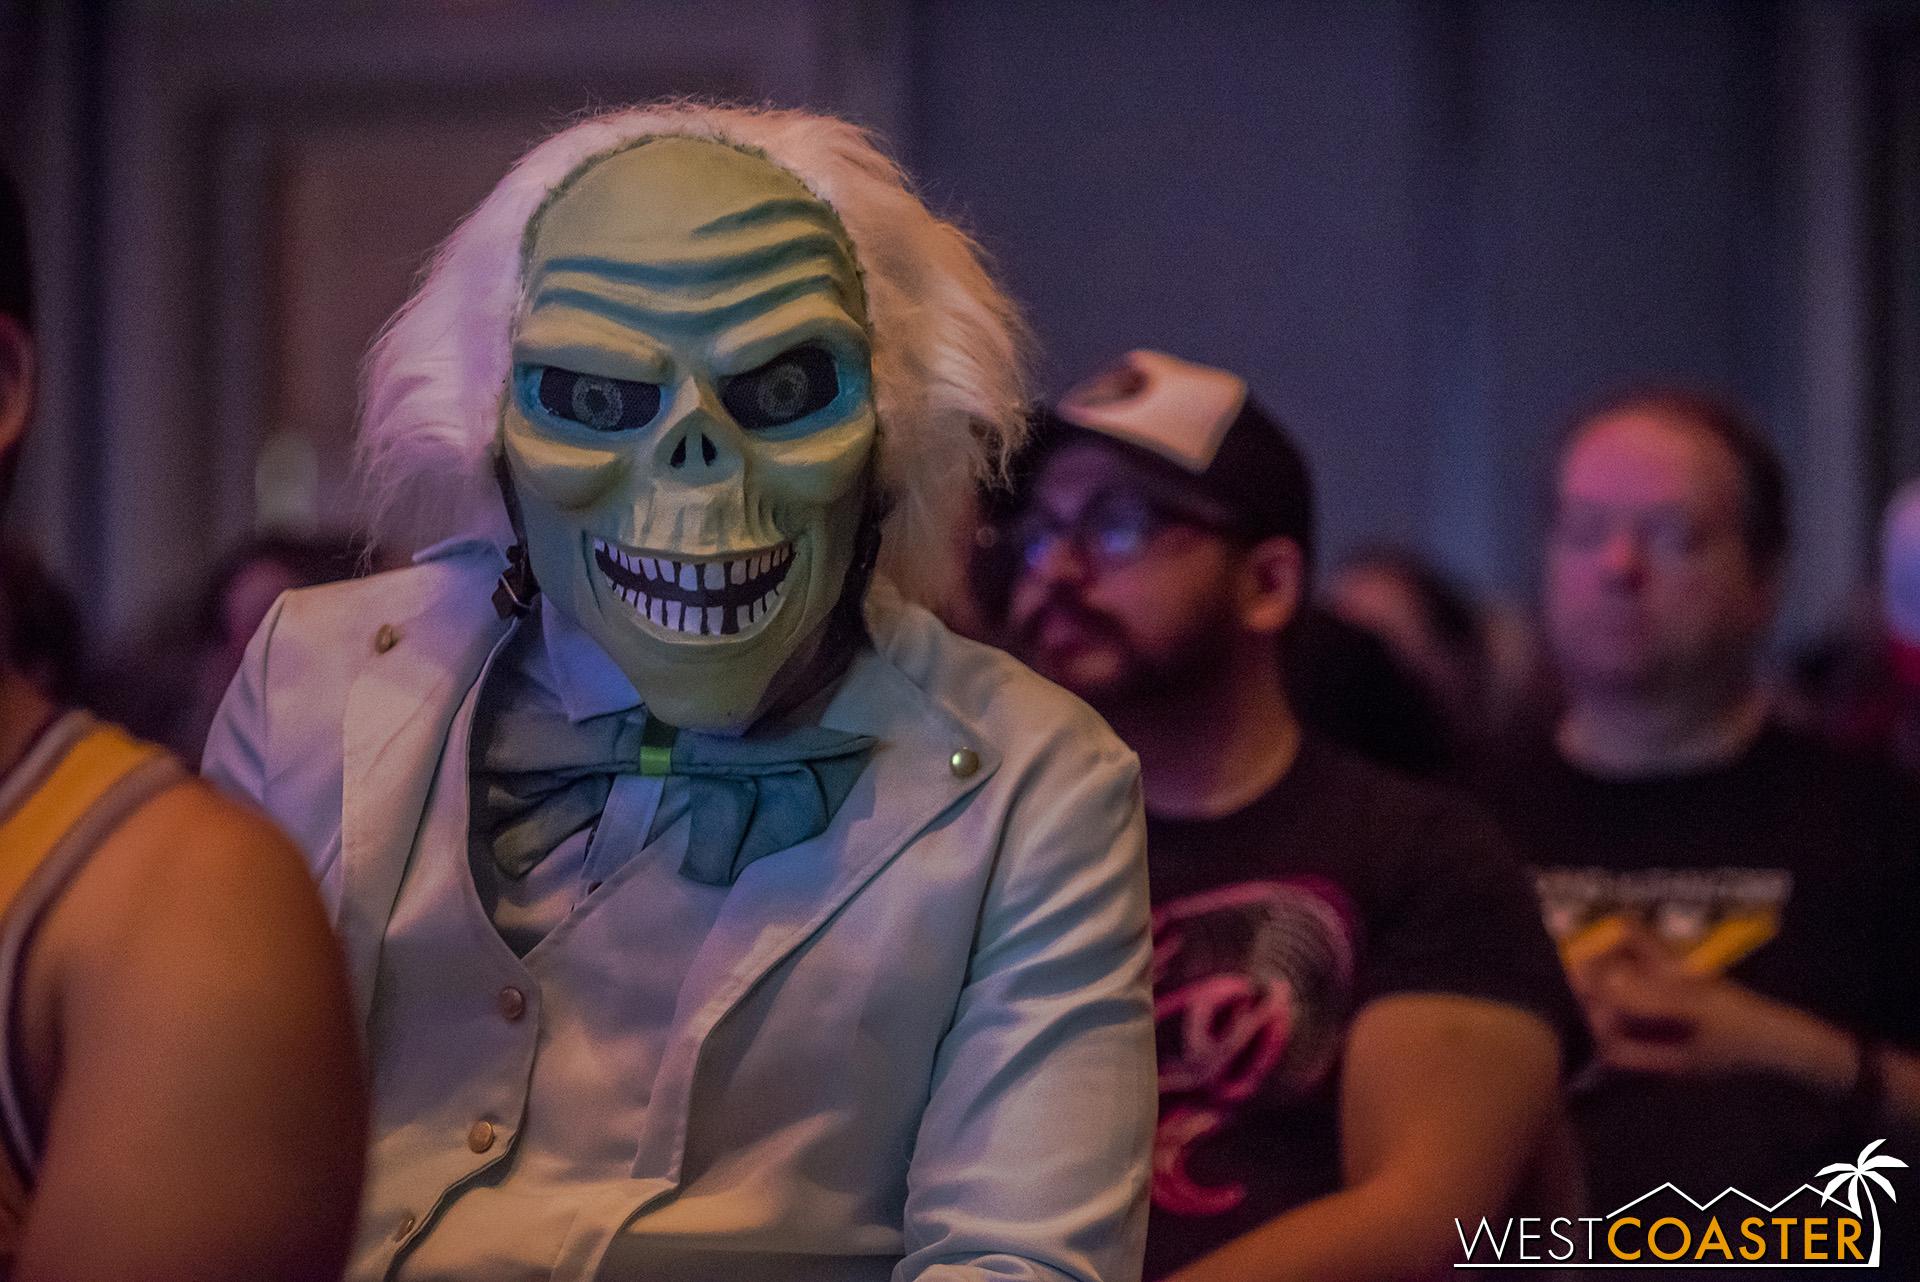 This Haunted Mansion phantom was just chilling at Midsummer Scream.